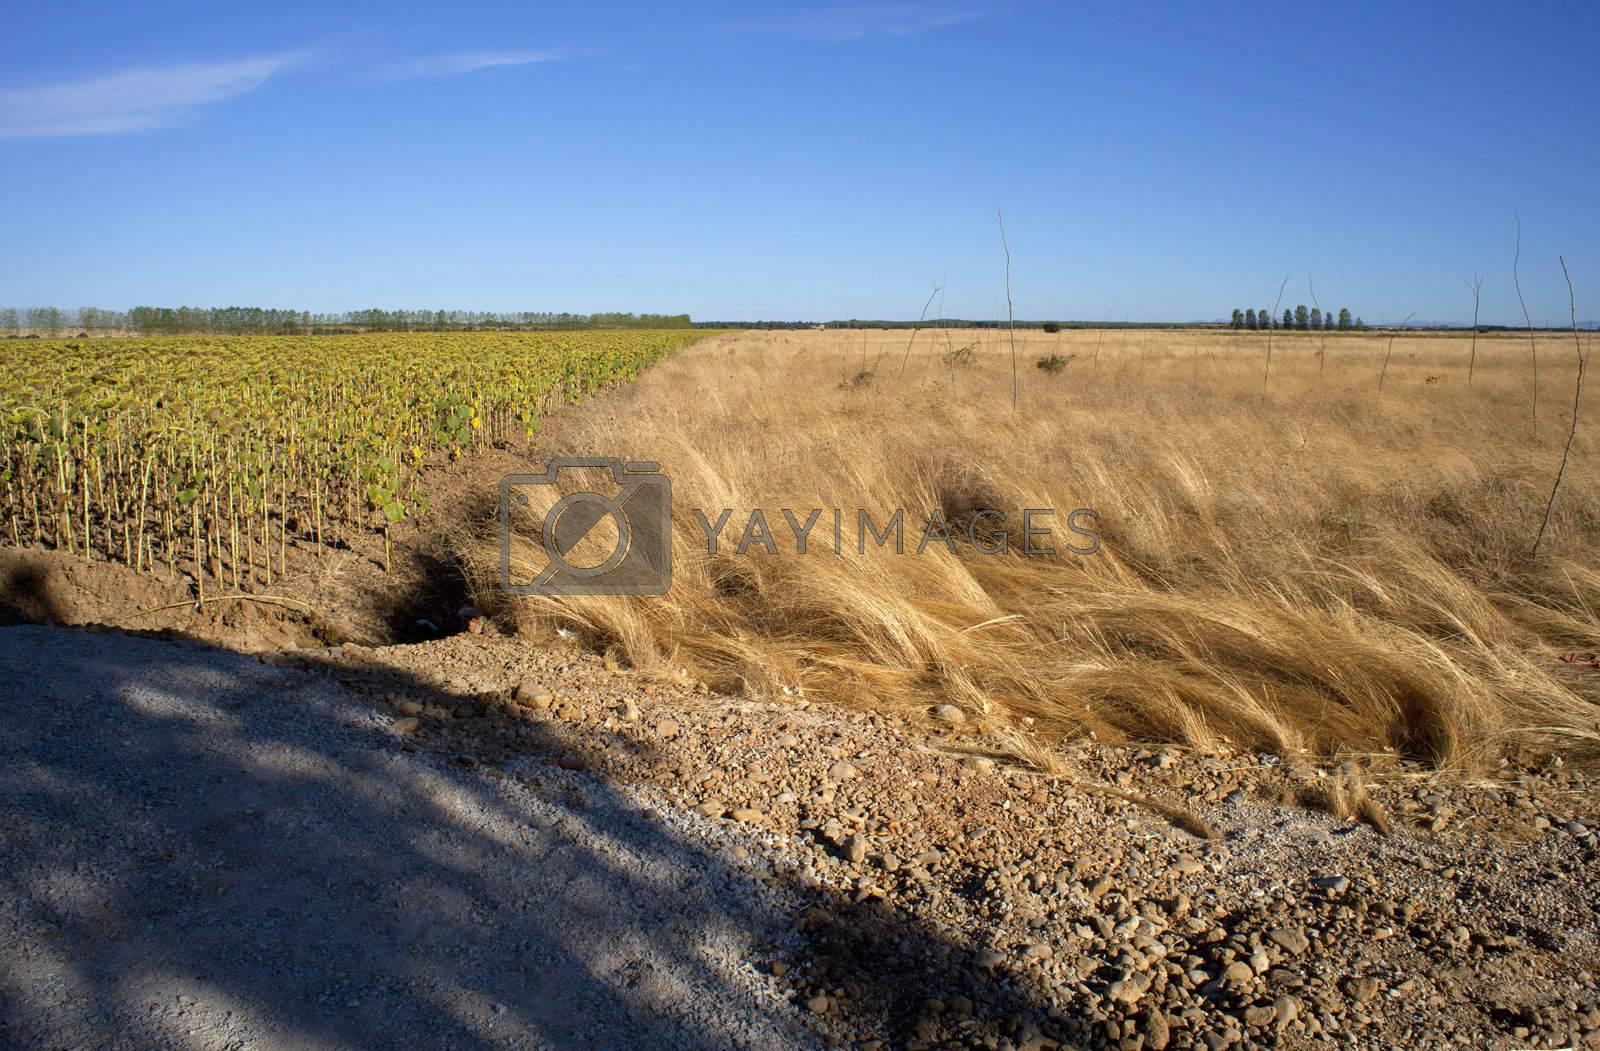 Rural scene in the spanish countryside